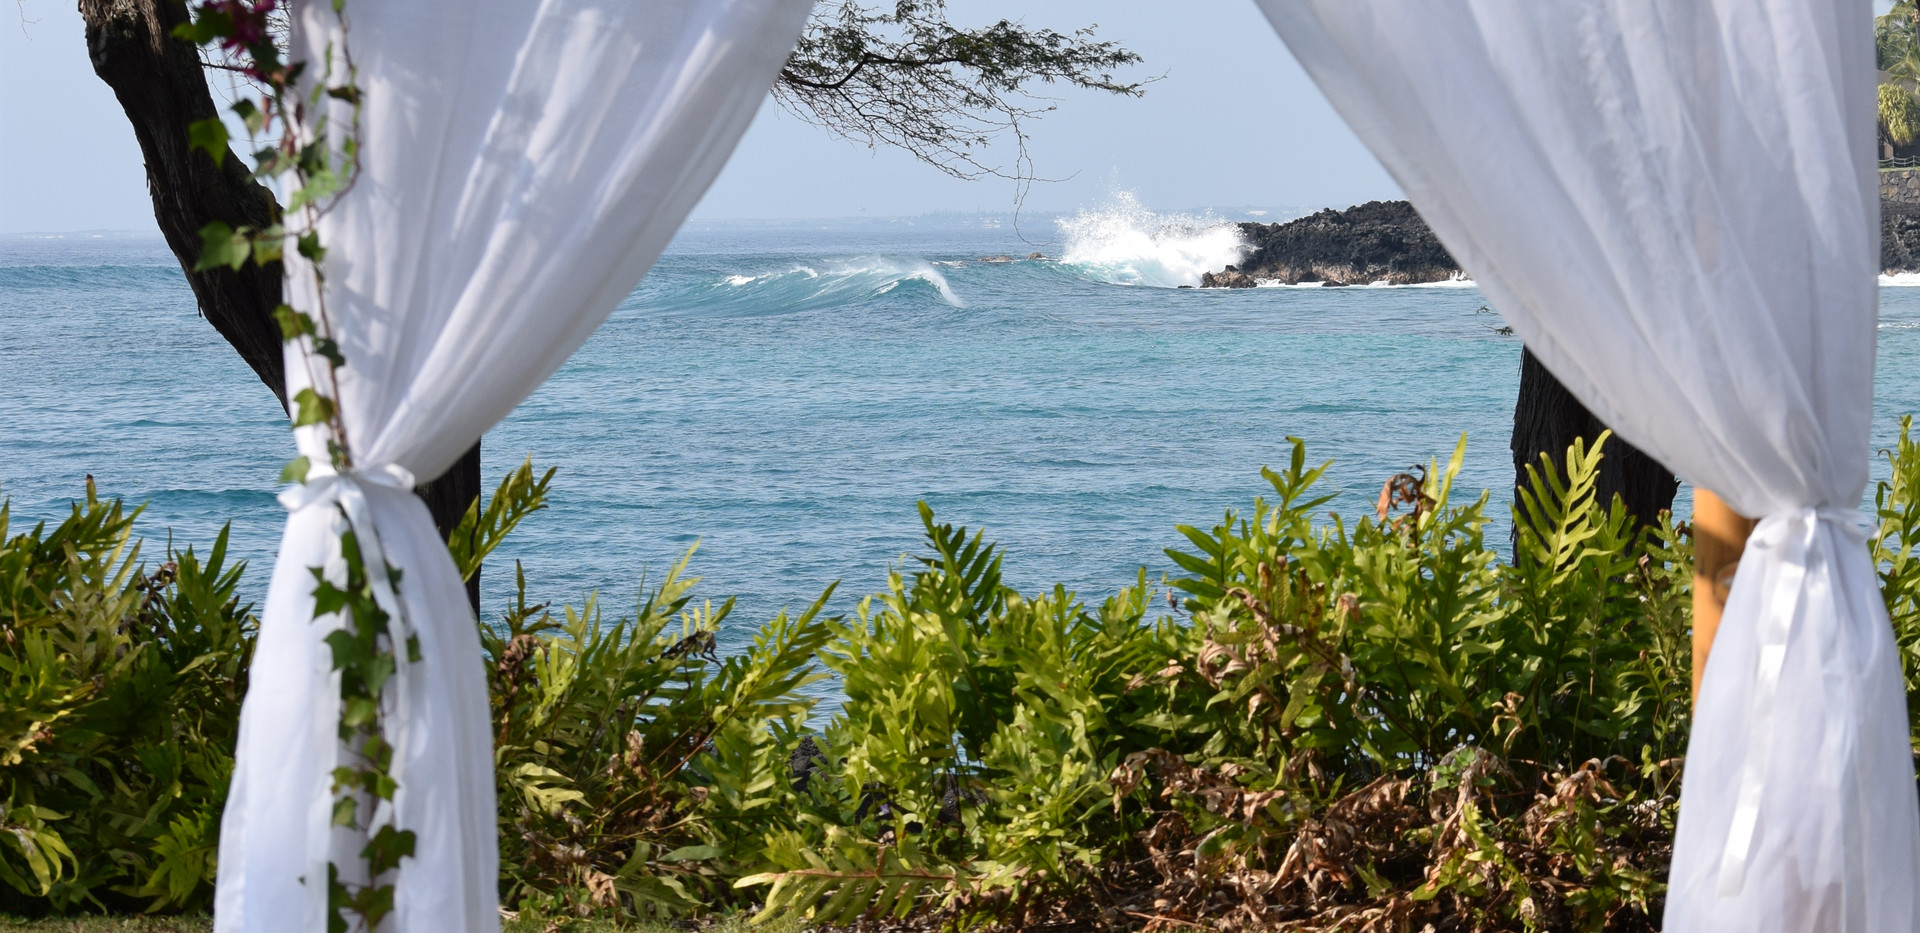 Curtain style arch